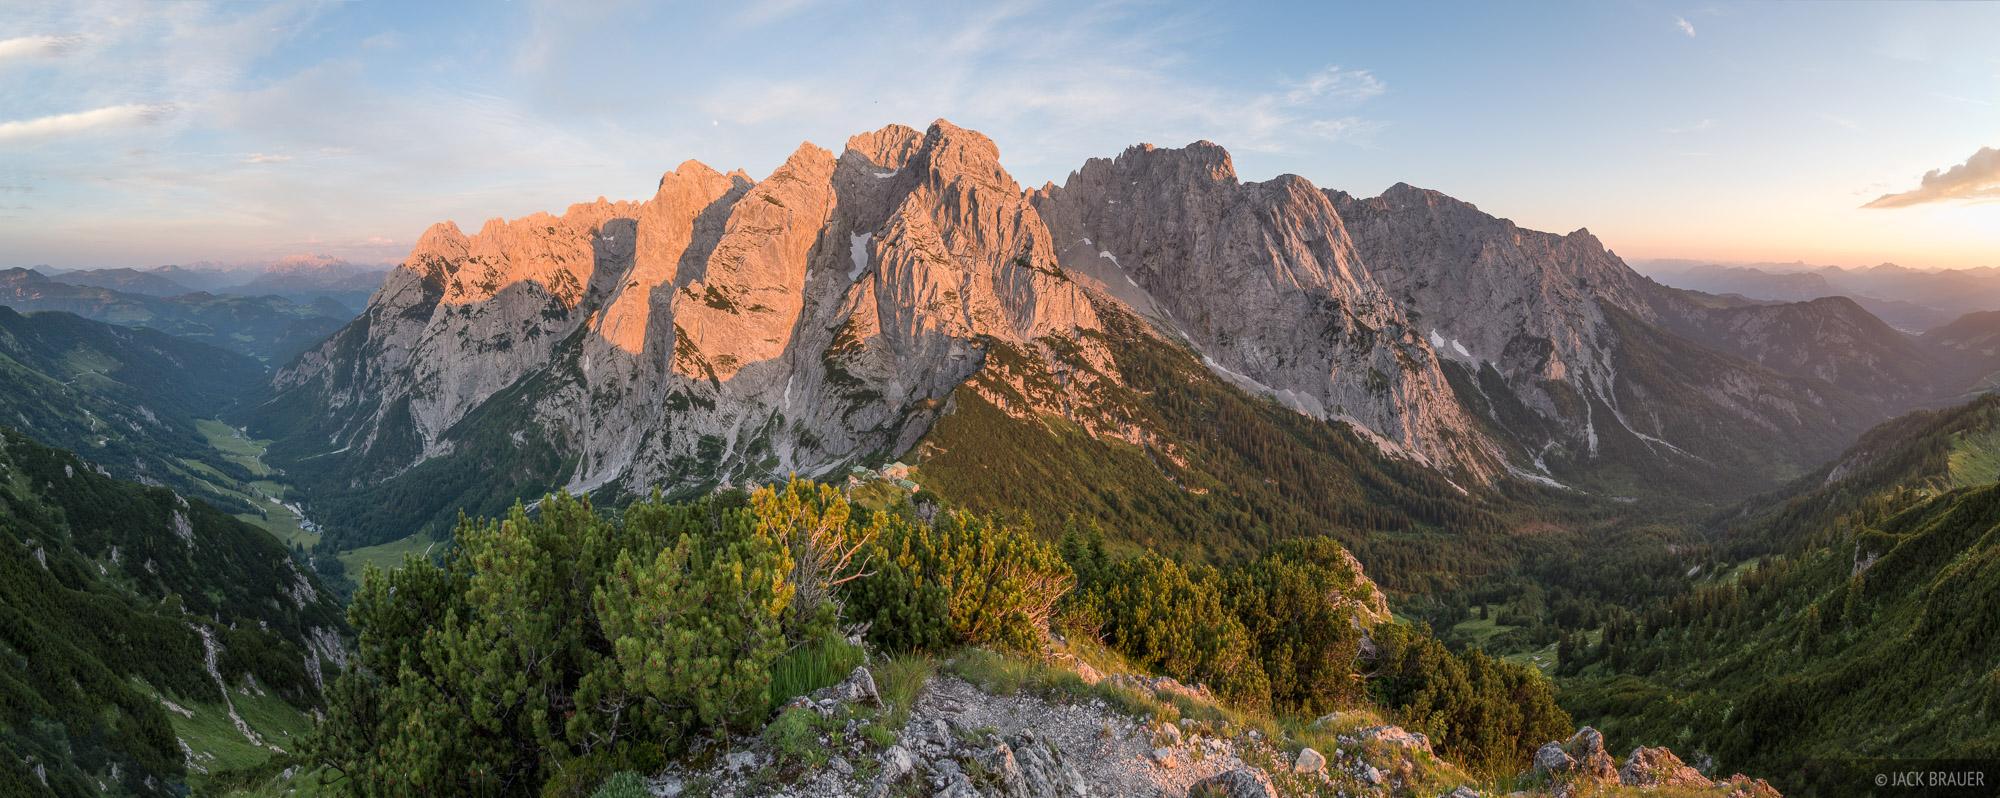 Austria, Kaisergebirge, Stripsenjochhaus, Stripsenkopf, Wilder Kaiser, sunset, panorama, photo